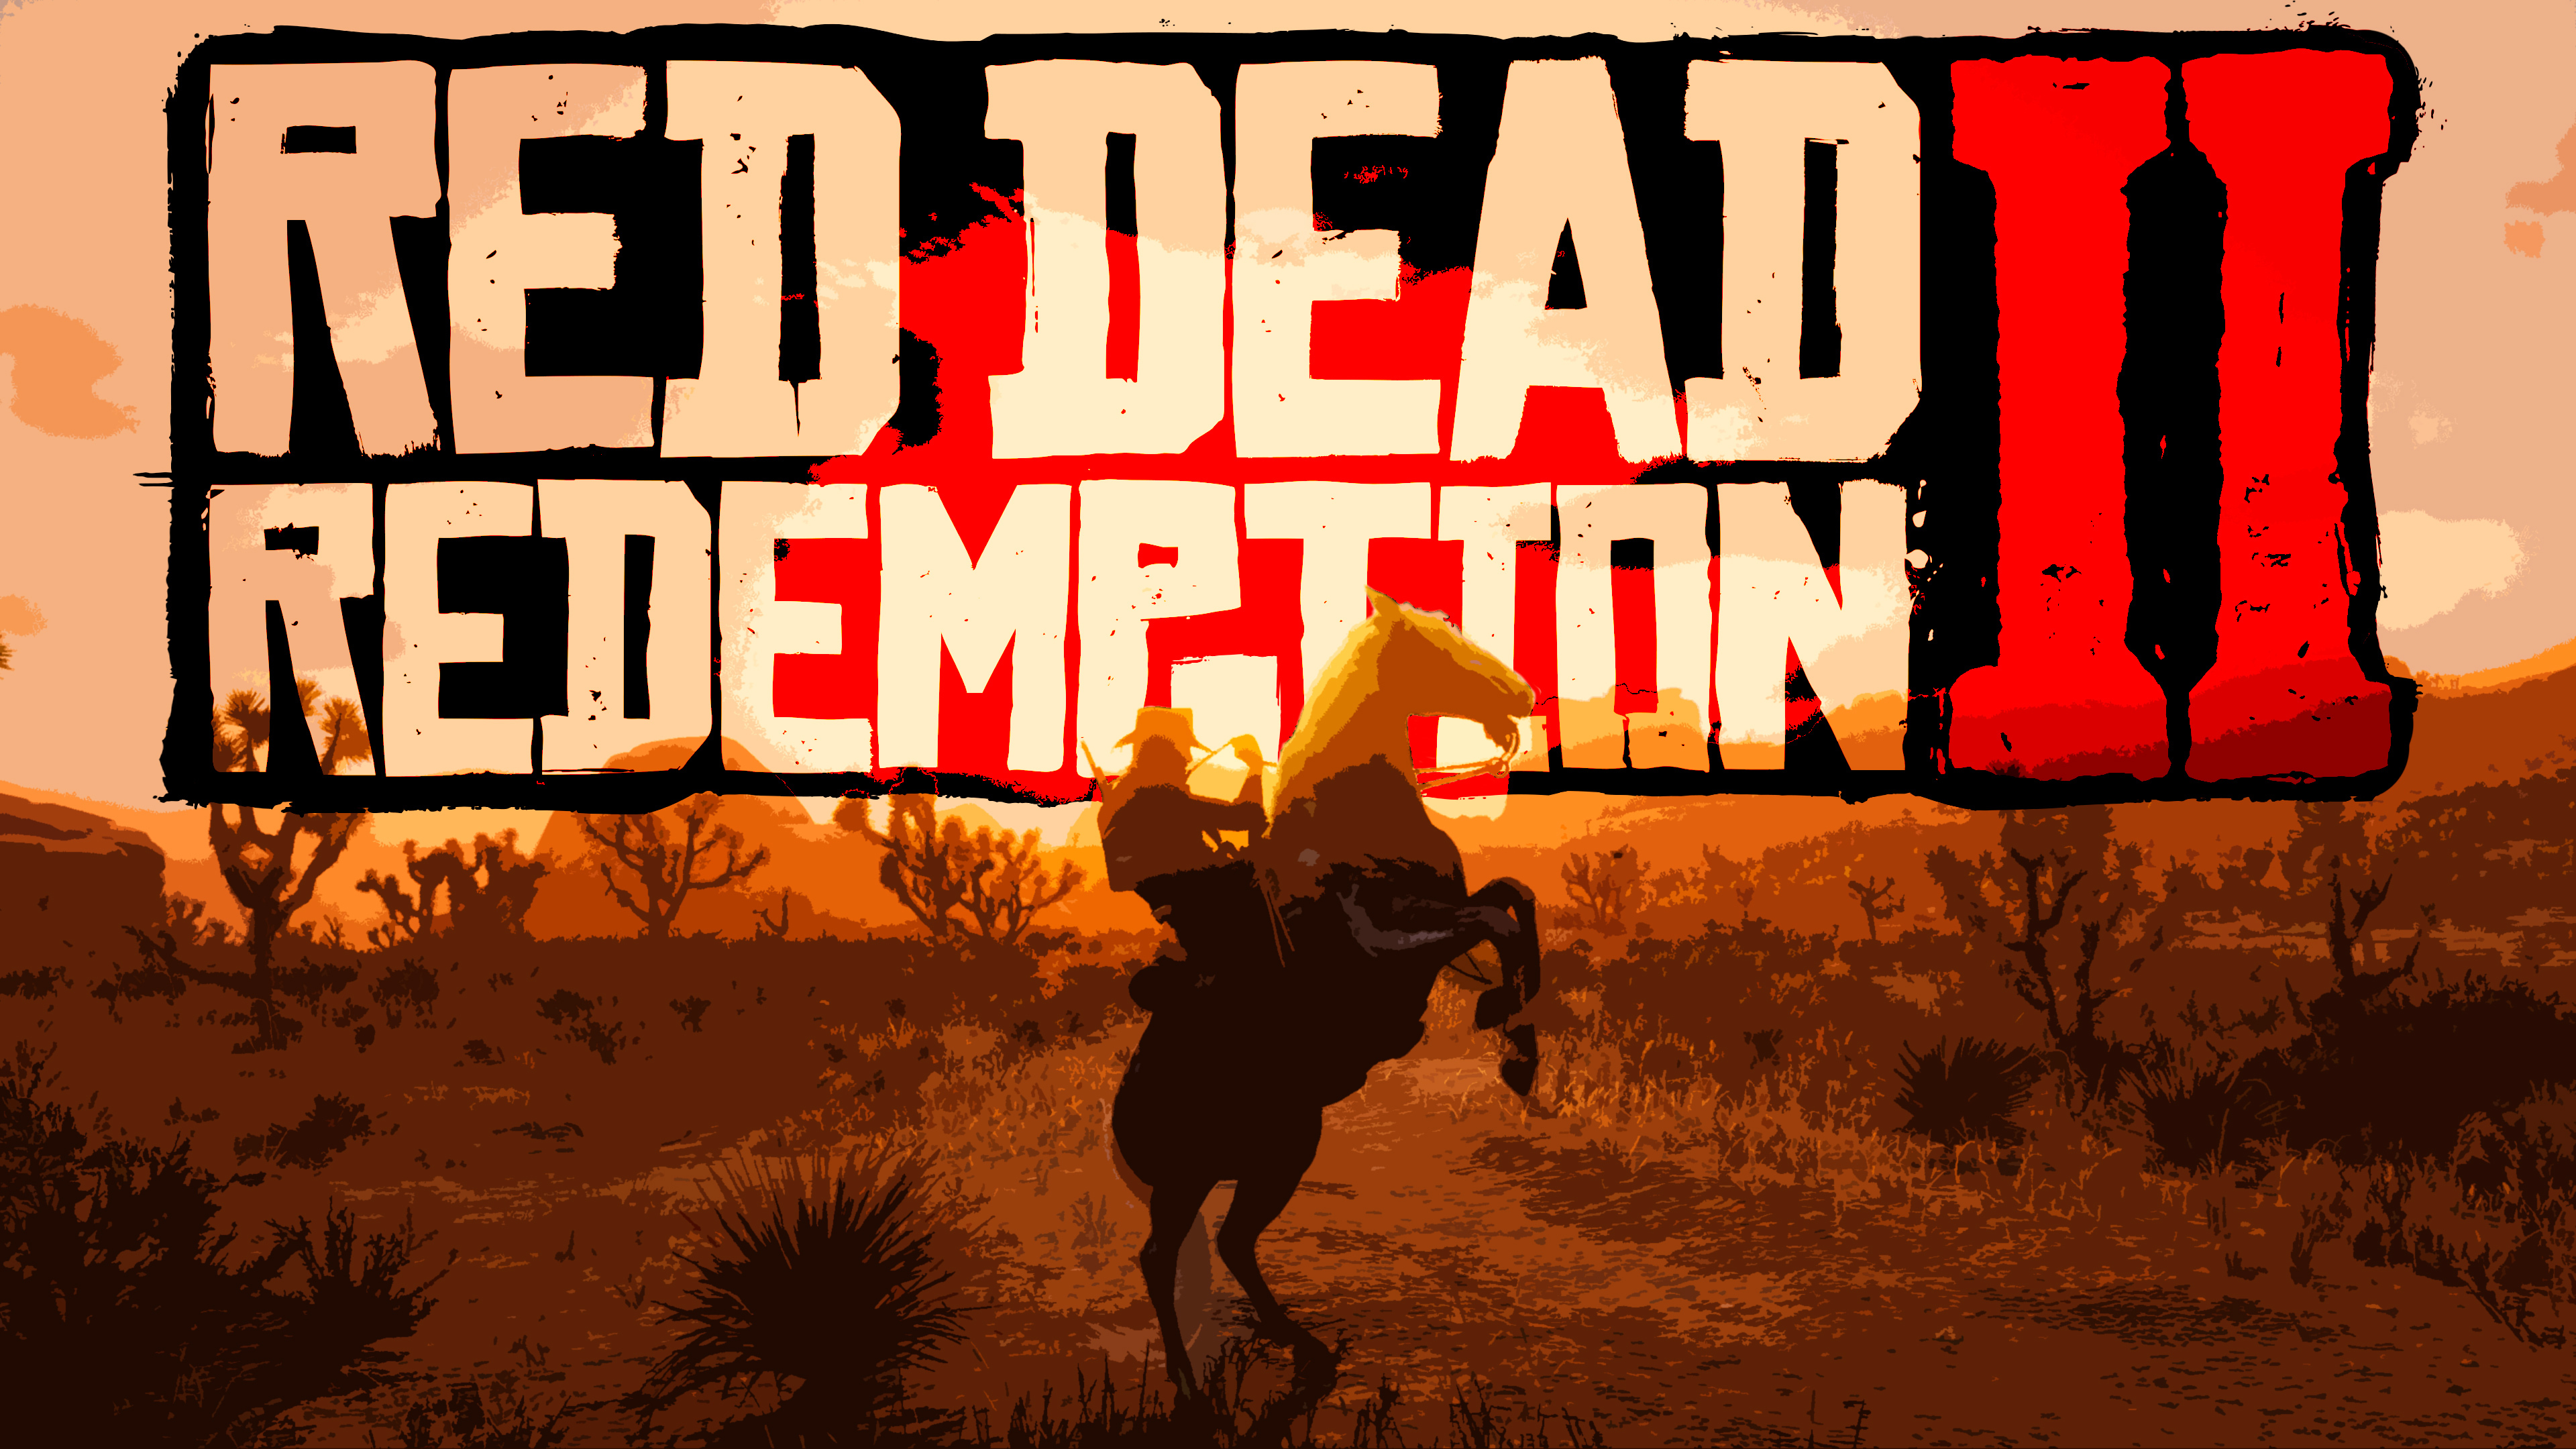 3840x2160 Red Dead Redemption 2 4k 2019 Game 4k HD 4k ...